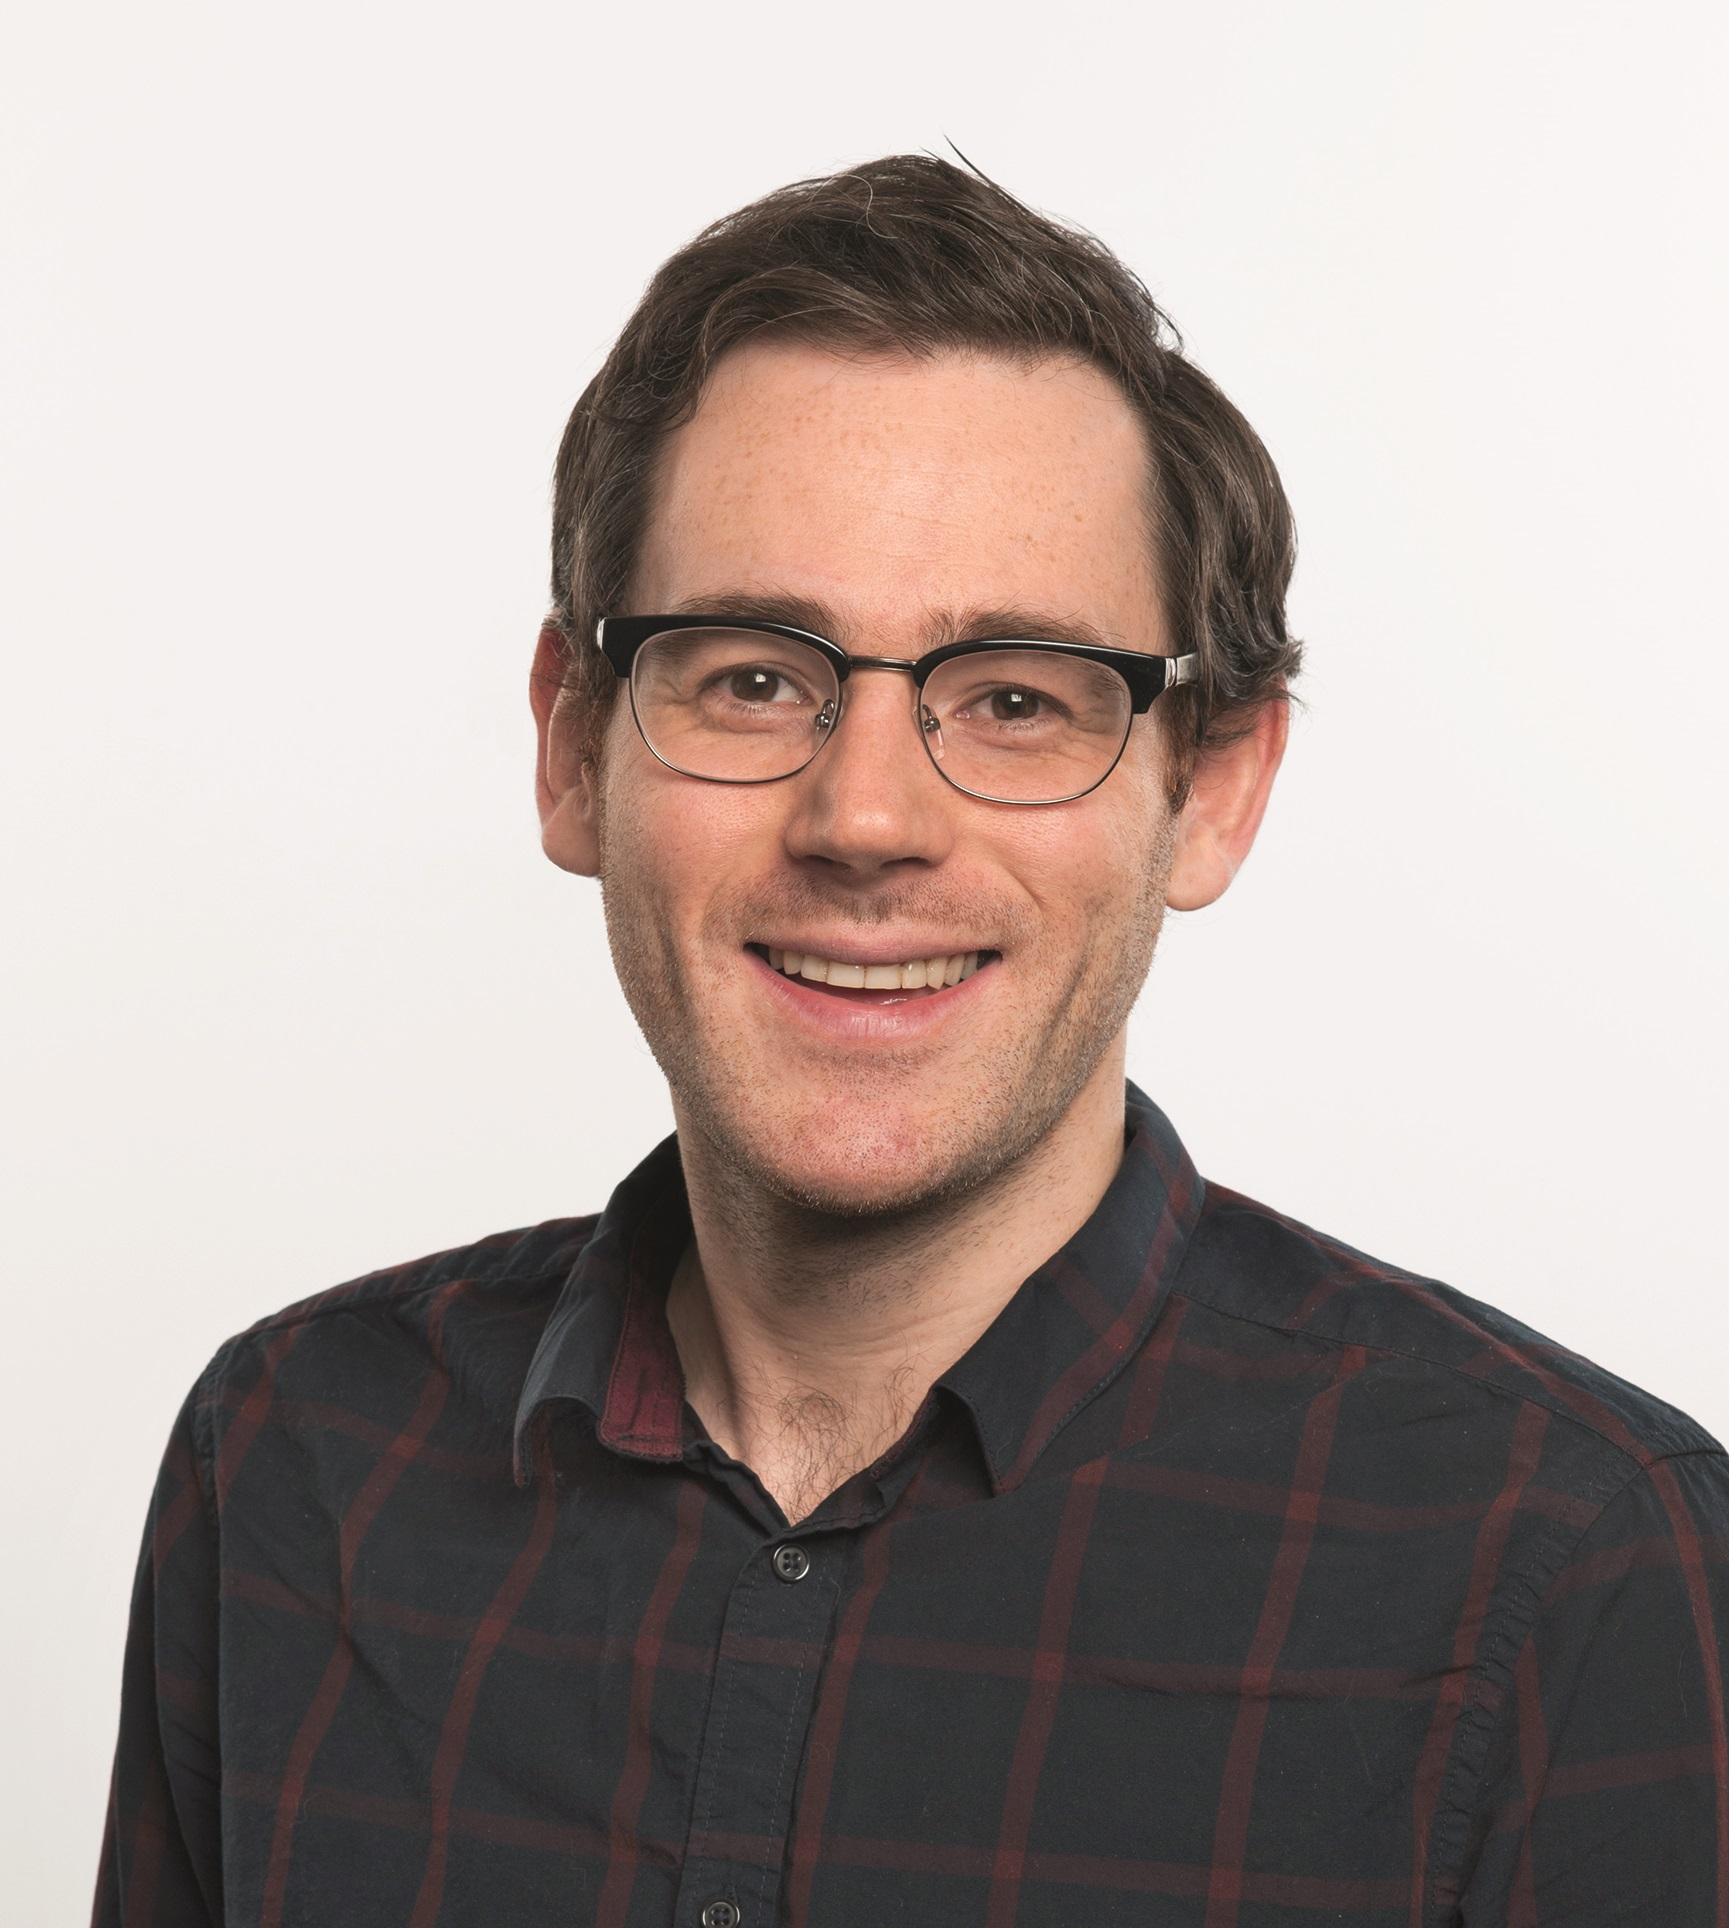 Andrew Laughlin